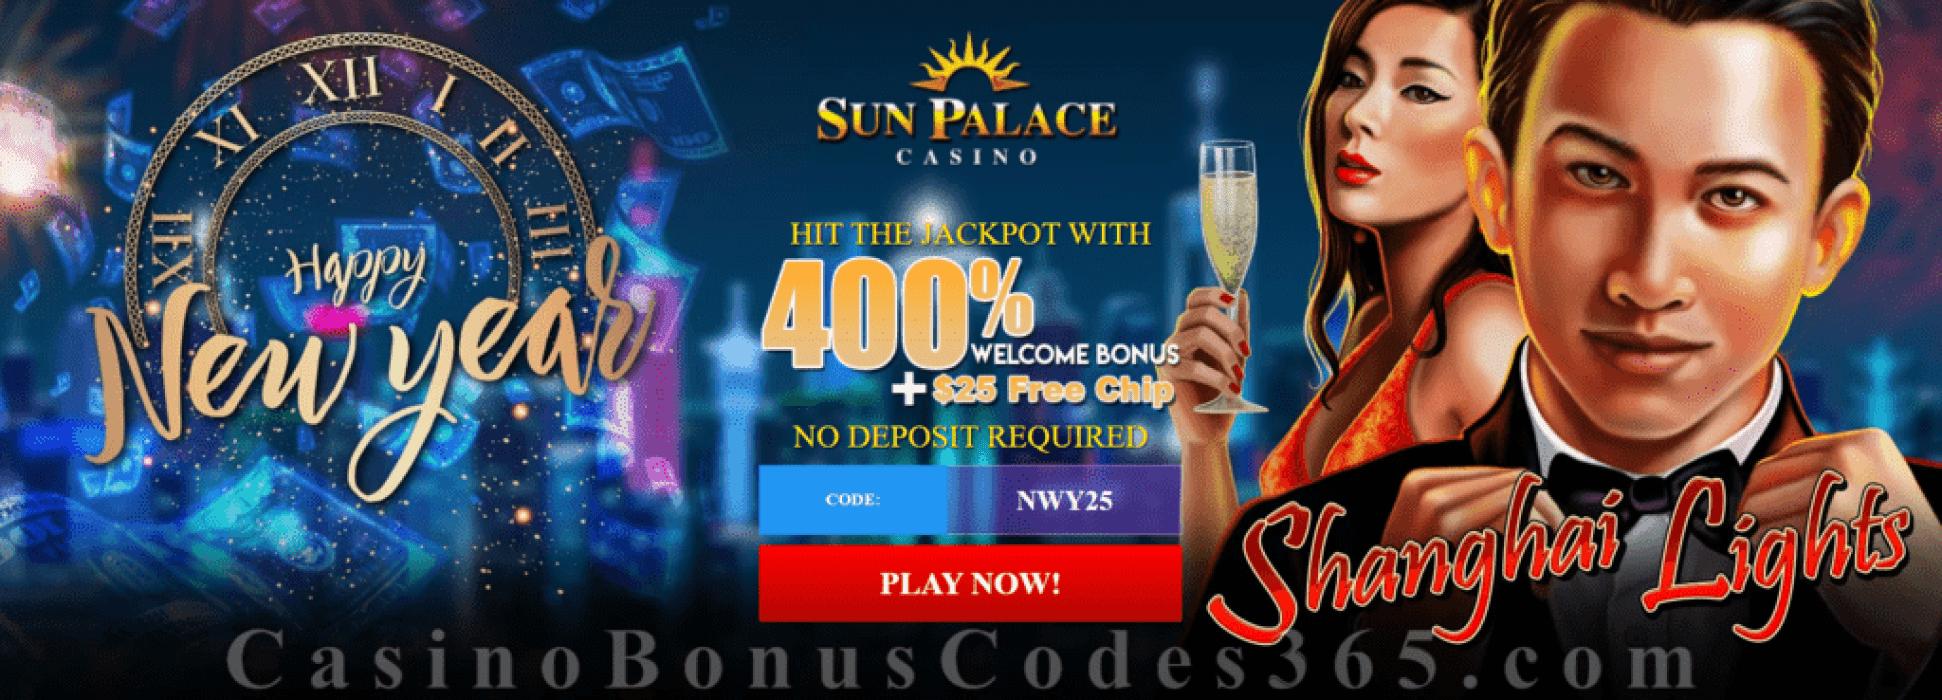 Sun Palace Casino $25 FREE Chip plus 400% Match Special New Year Bonus